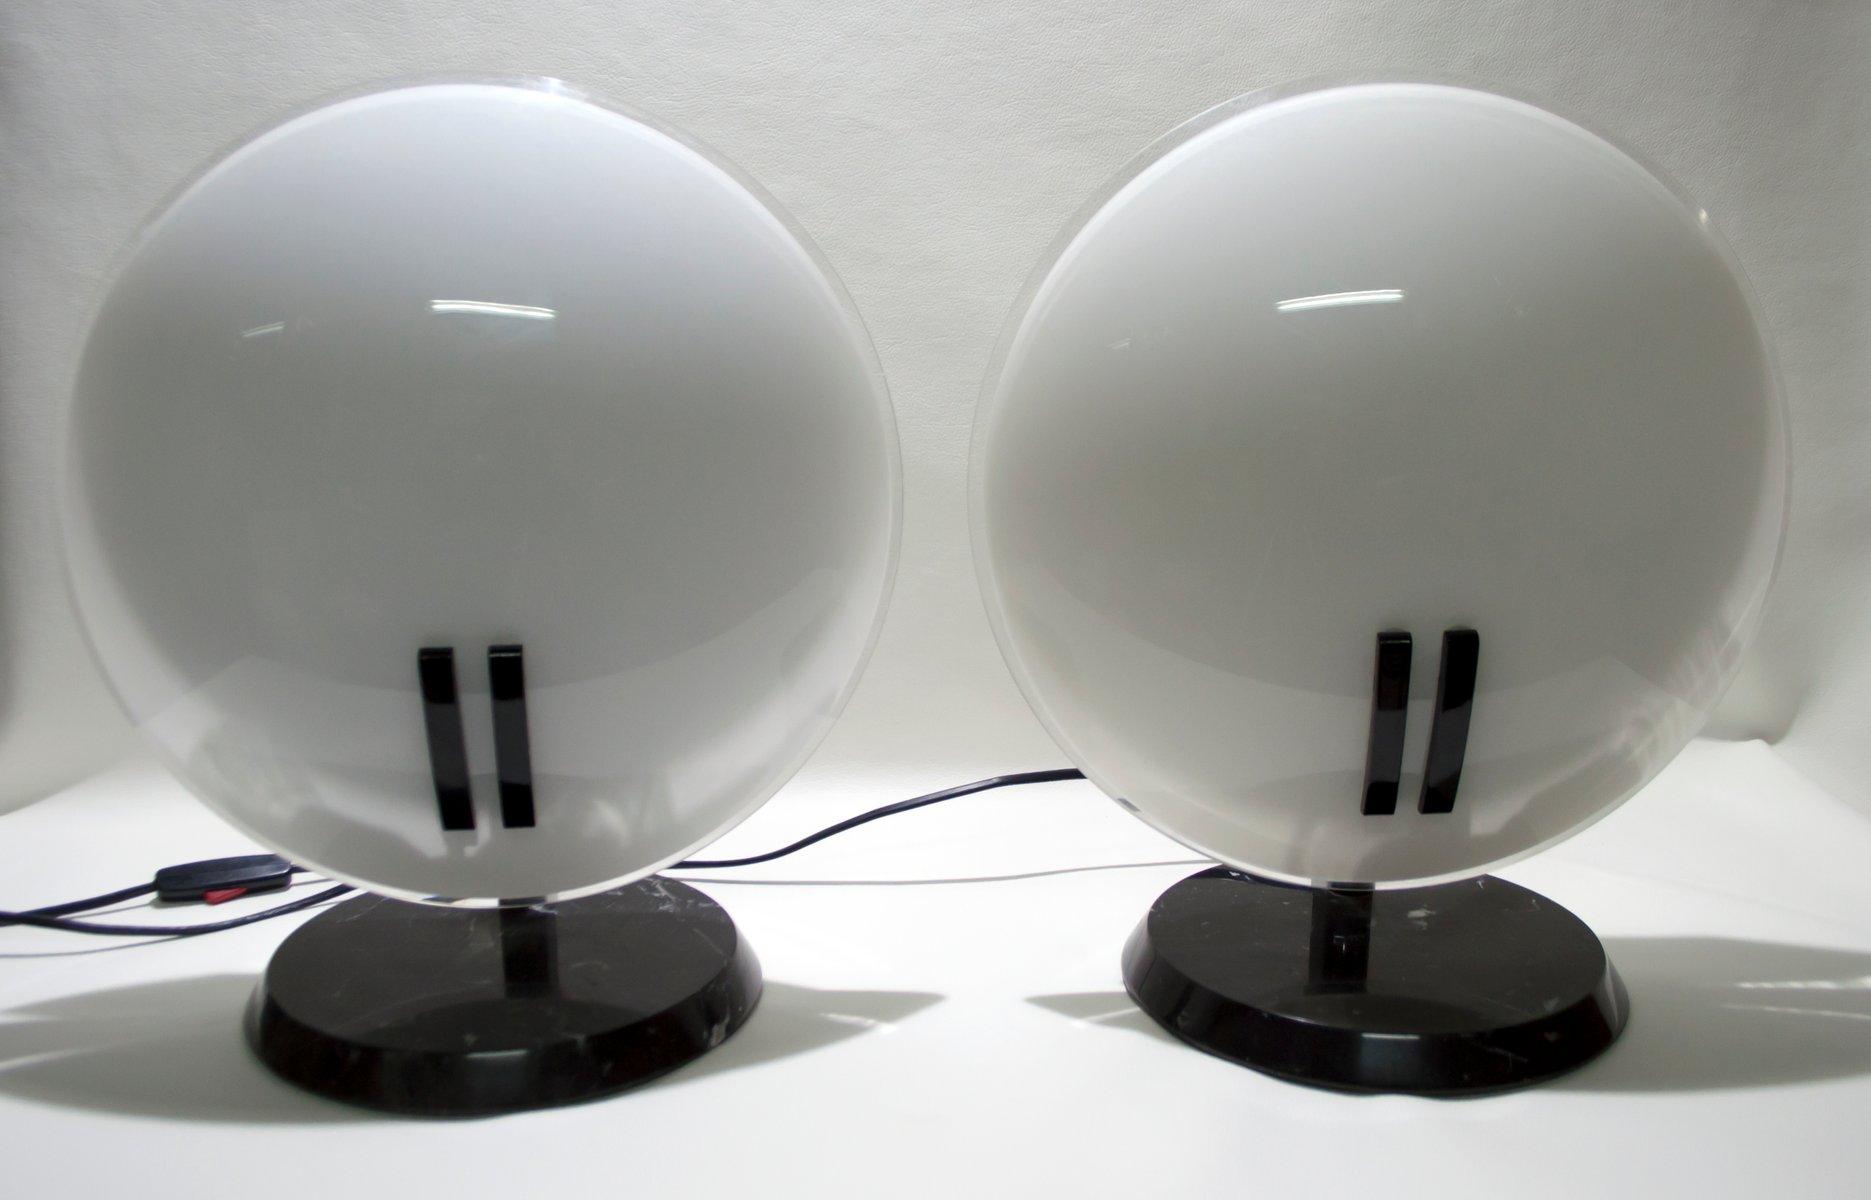 Modell Pearl Tischlampen von Bruno Gecchelin für Oluce, 1980er, 2er Se...